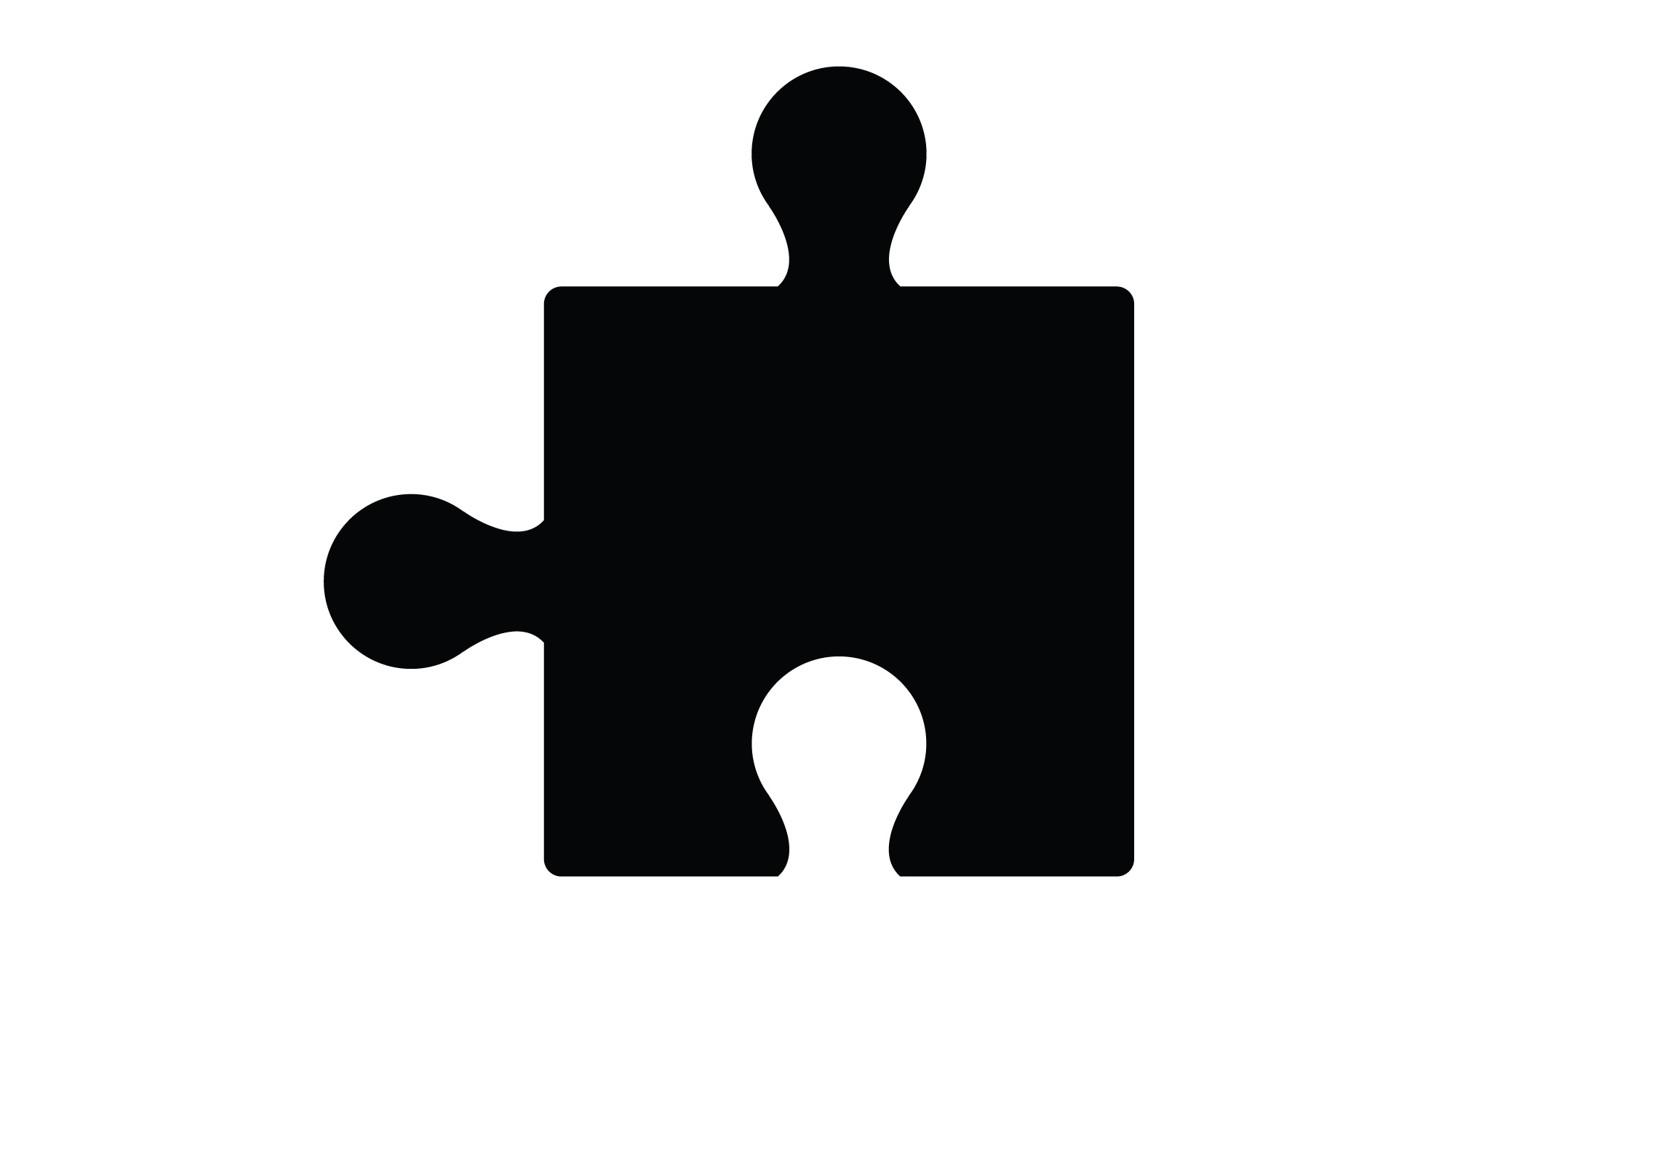 puzzle_piece8_RECT.jpg